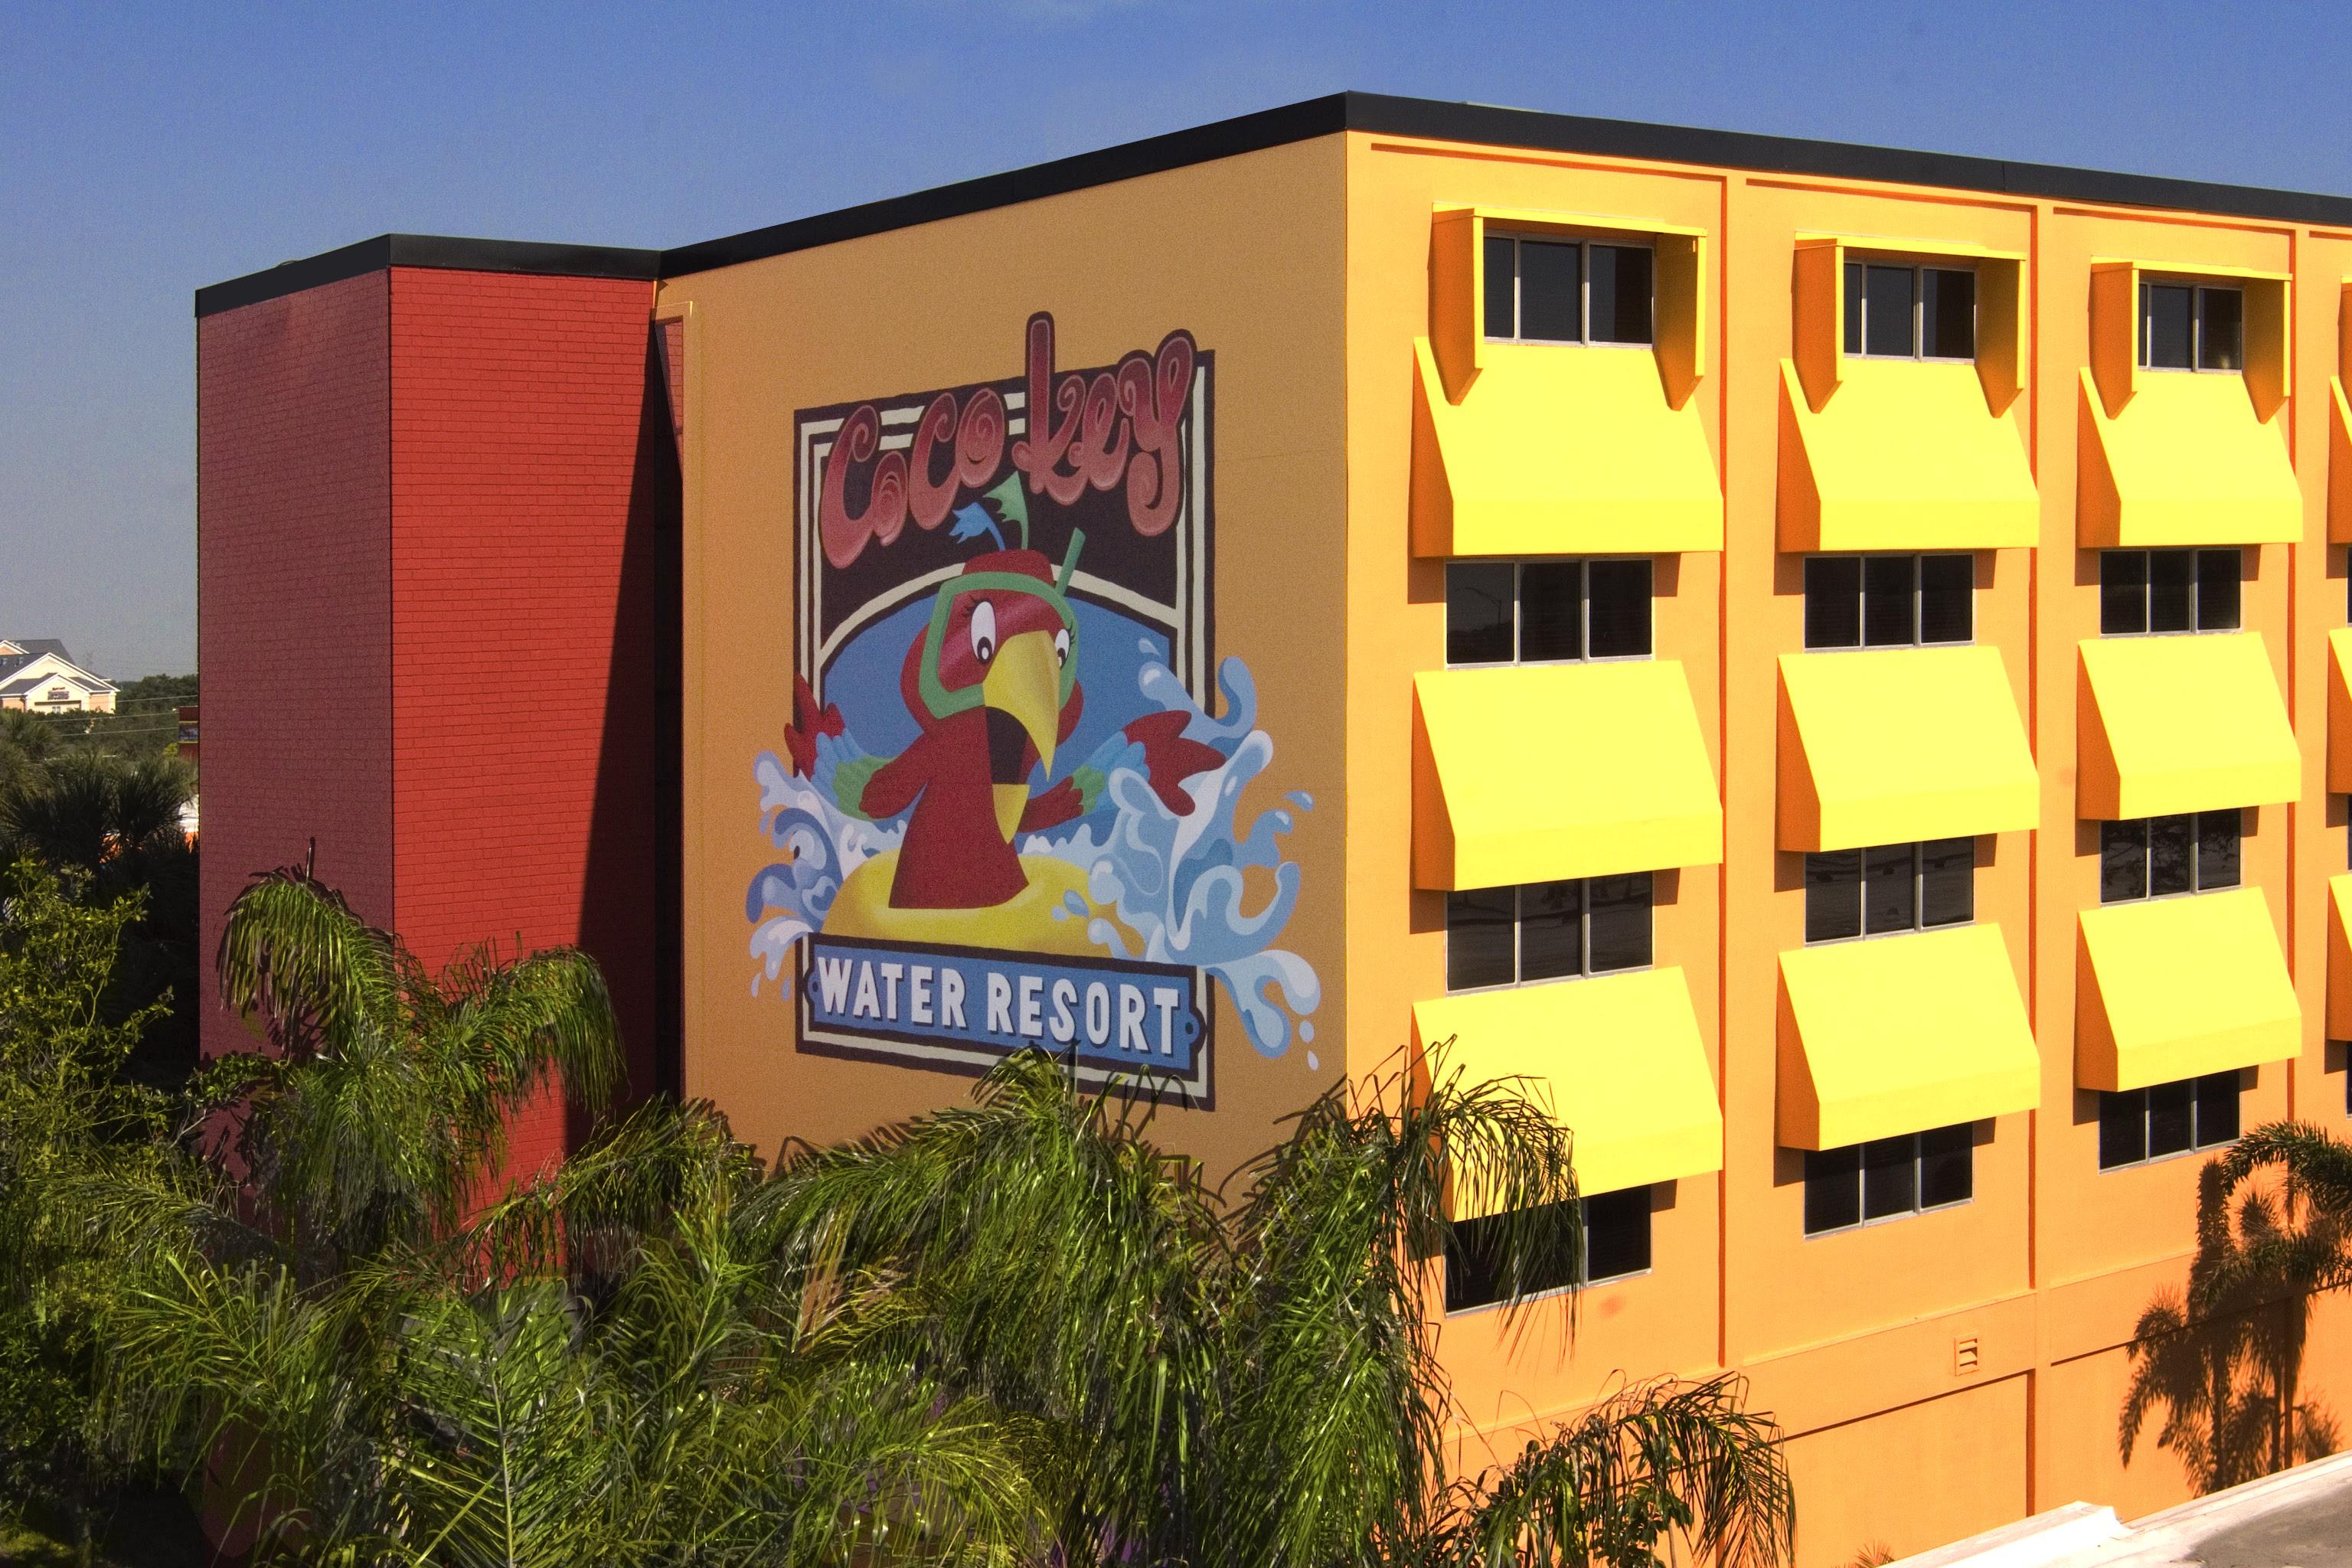 2 Nights in Coco Key Resort Orlando 99